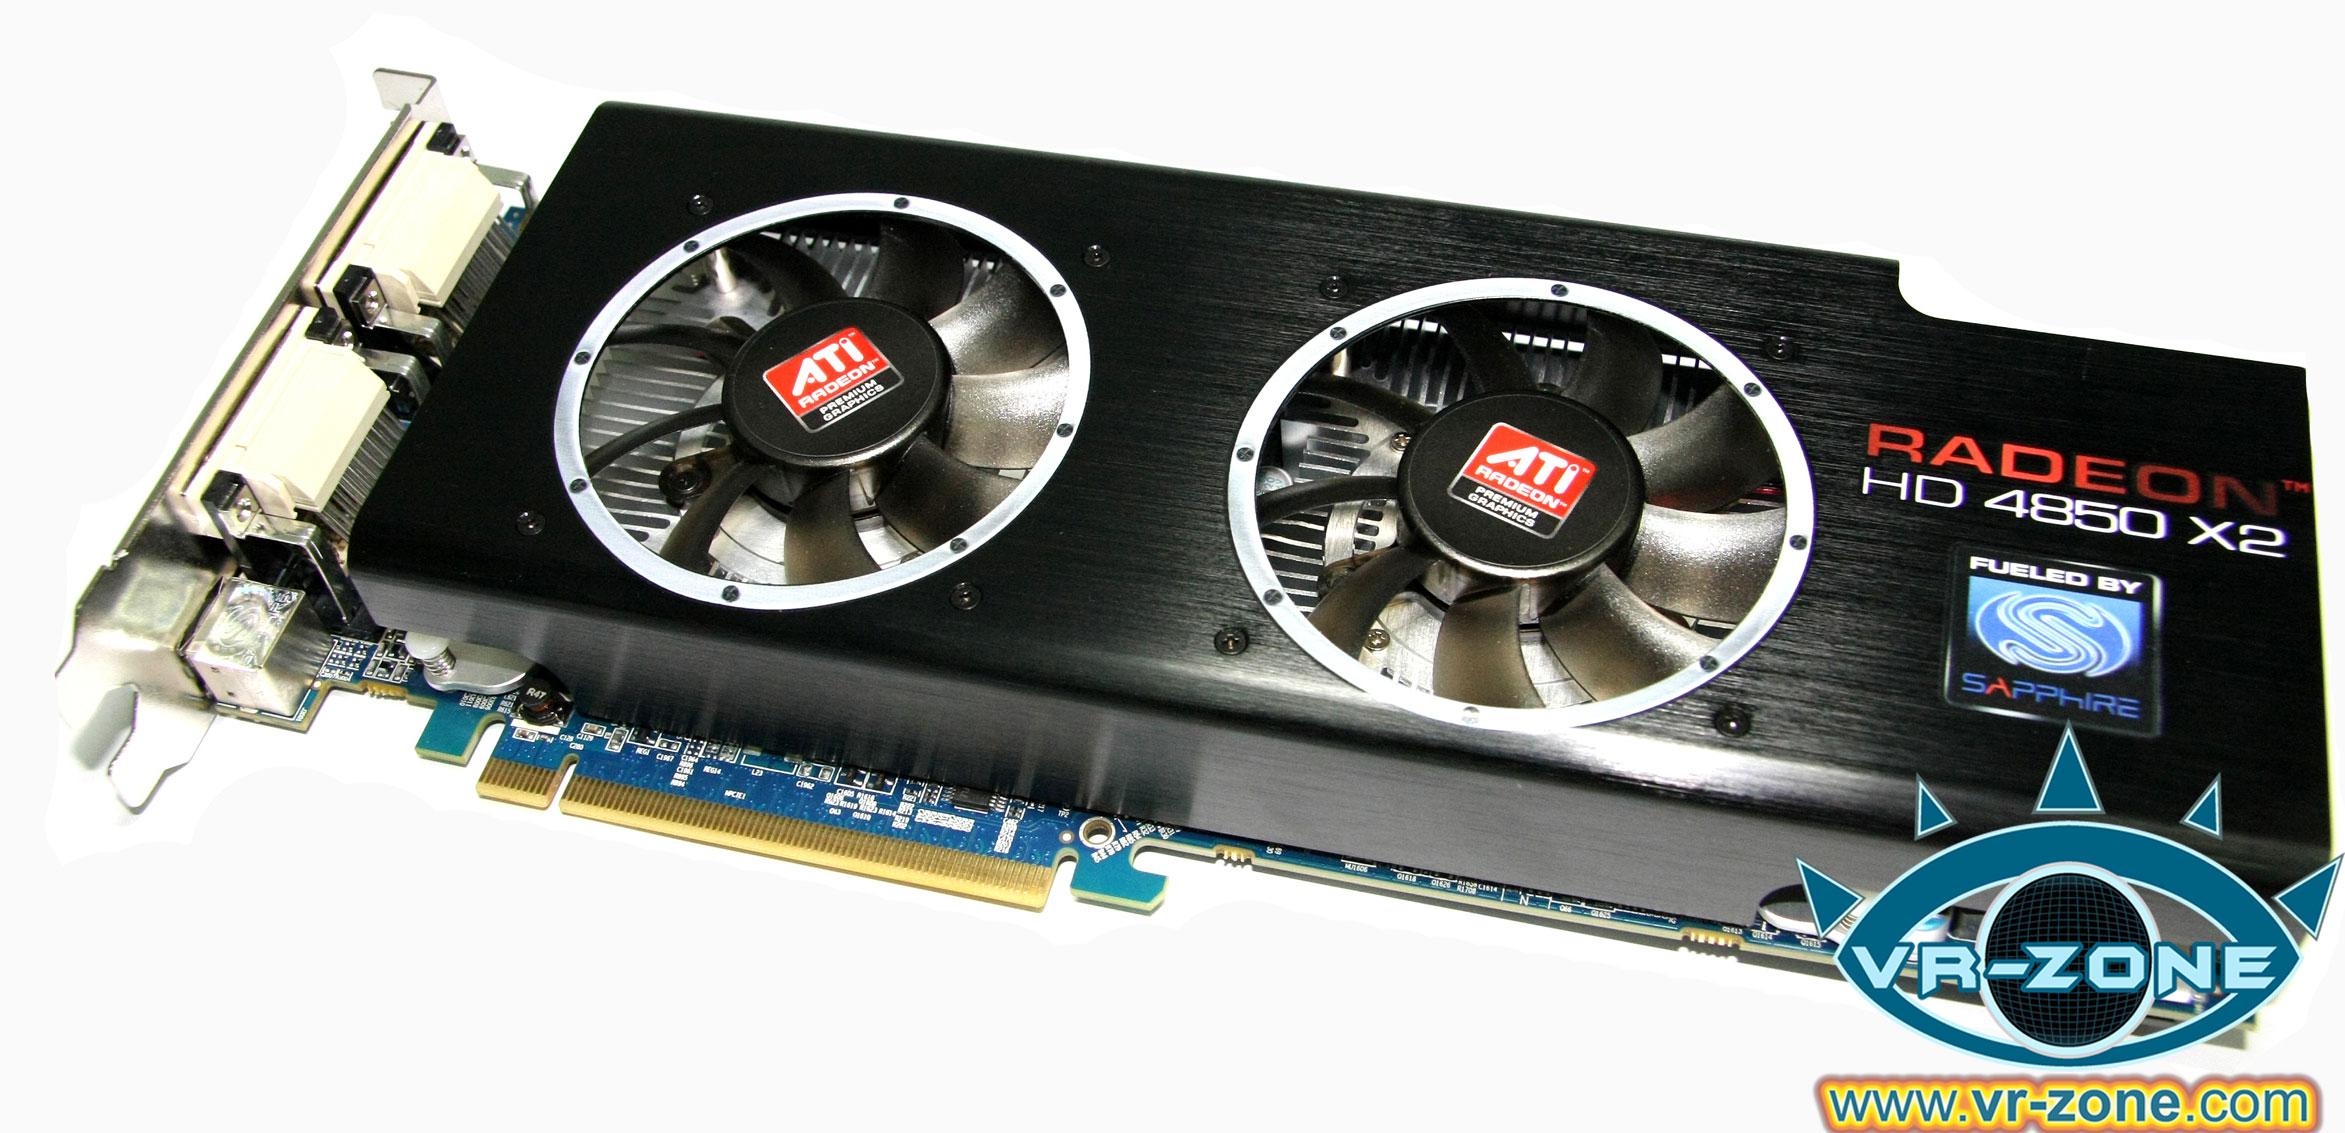 ATI Radeon HD 4850 X2 Catalyst Drivers for PC